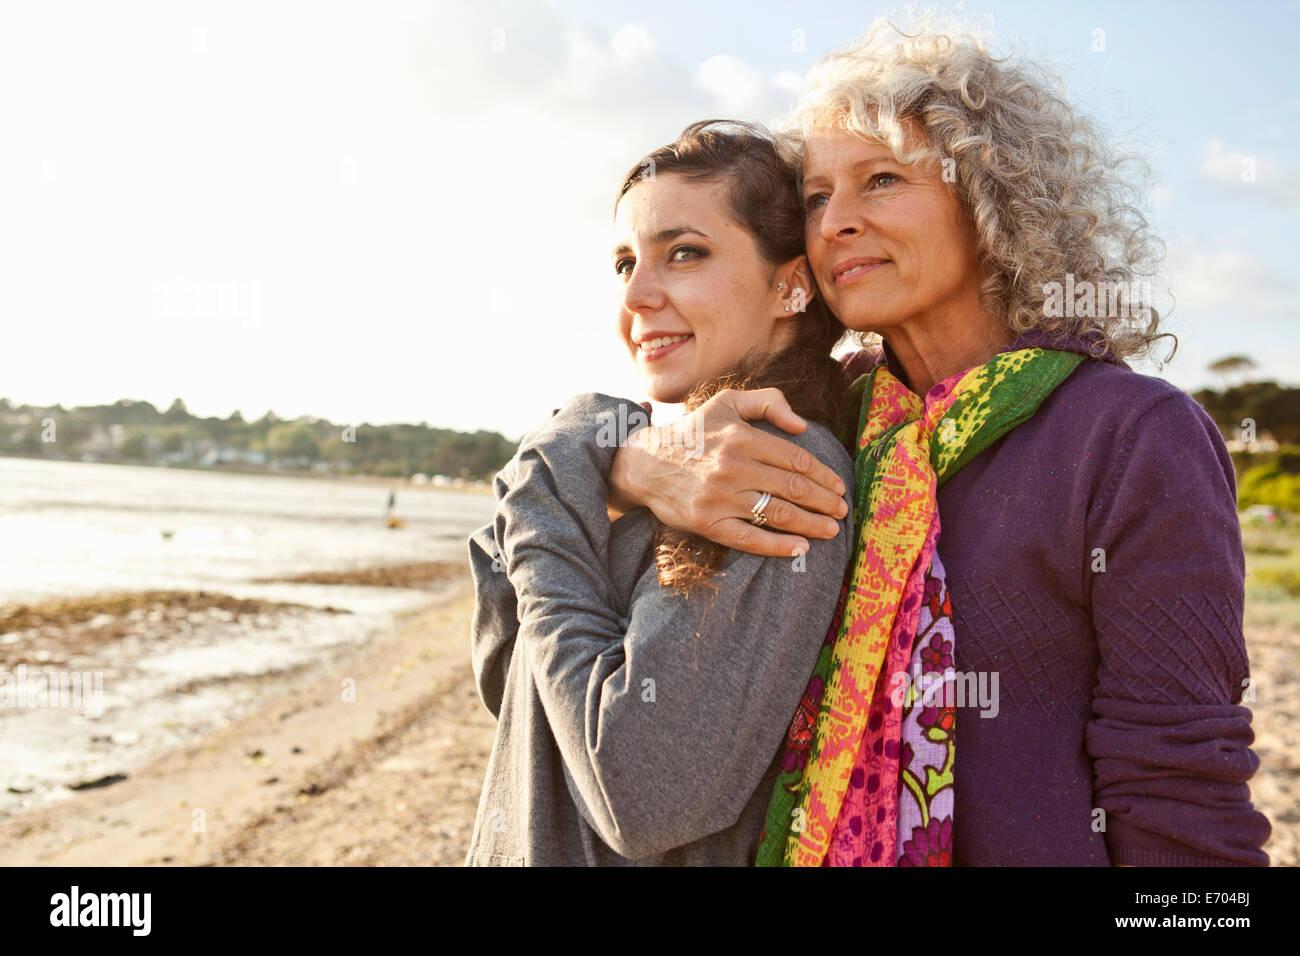 Madre e hija, disfrutar de la playa Imagen De Stock